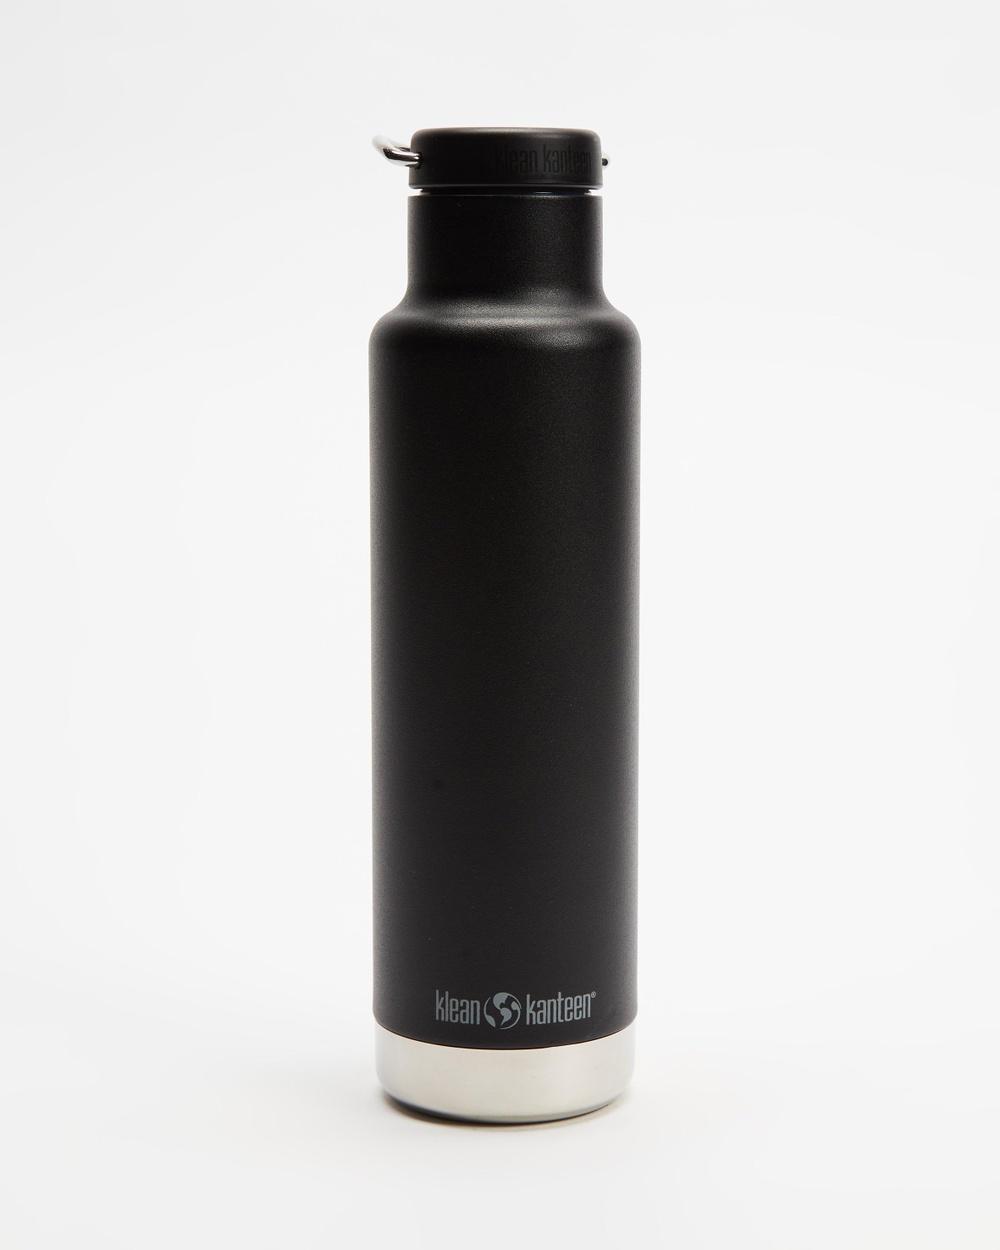 Klean Kanteen 20oz Insulated Classic Loop Cap Bottle Water Bottles Black